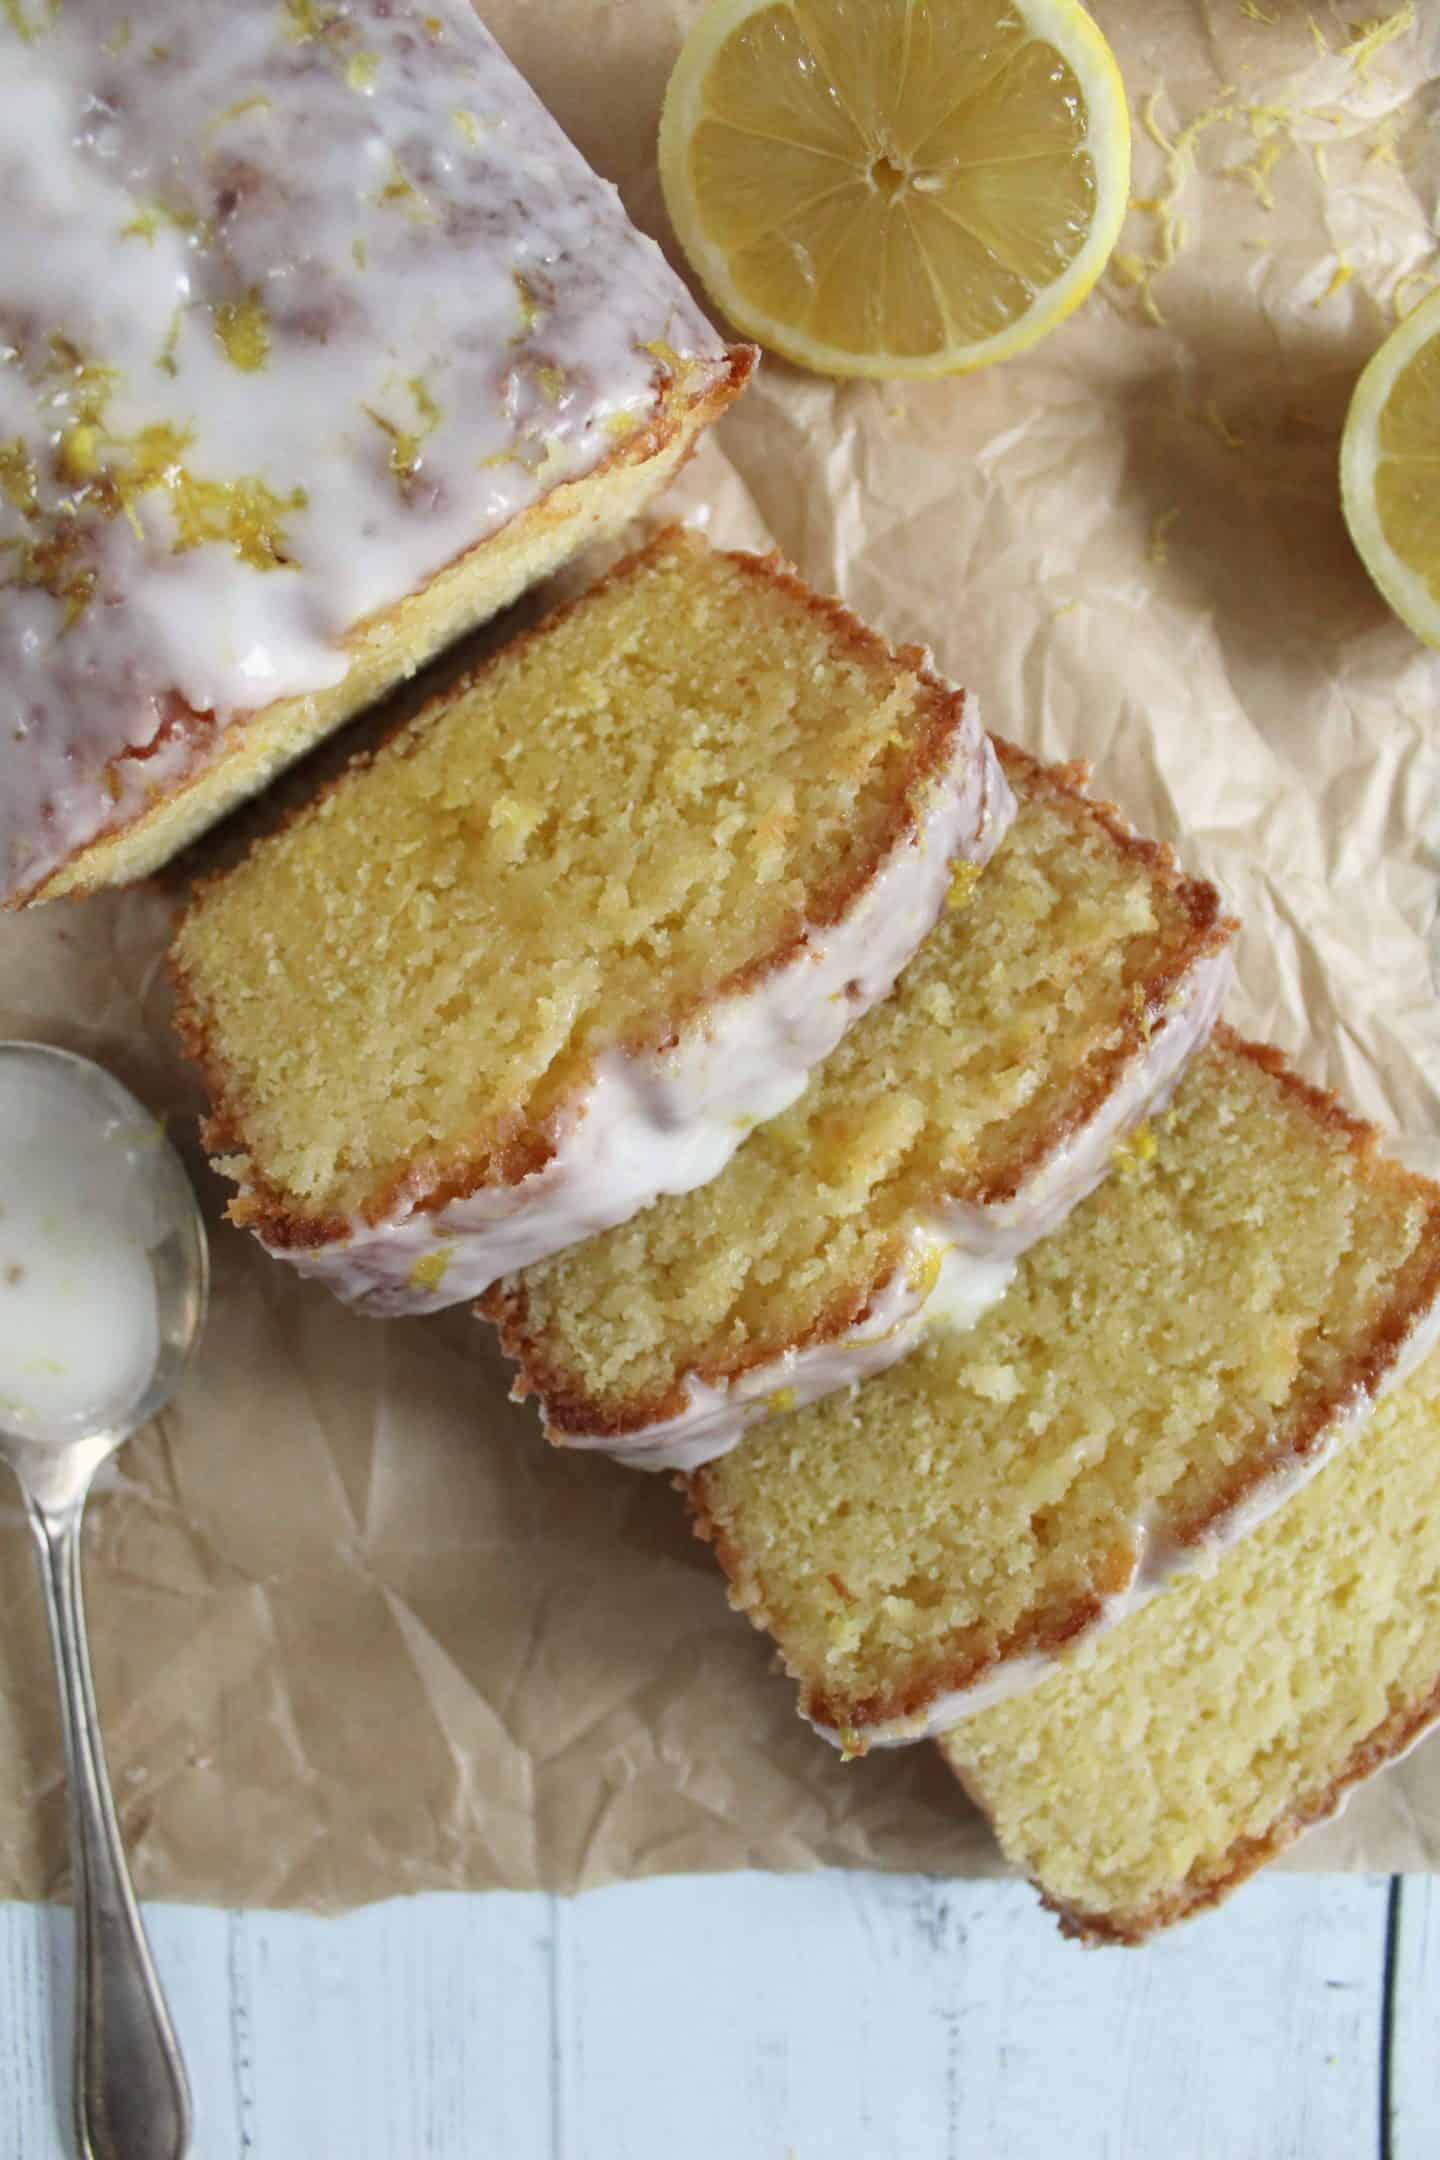 GLUTEN FREE LEMON DRIZZLE CAKE RECIPE